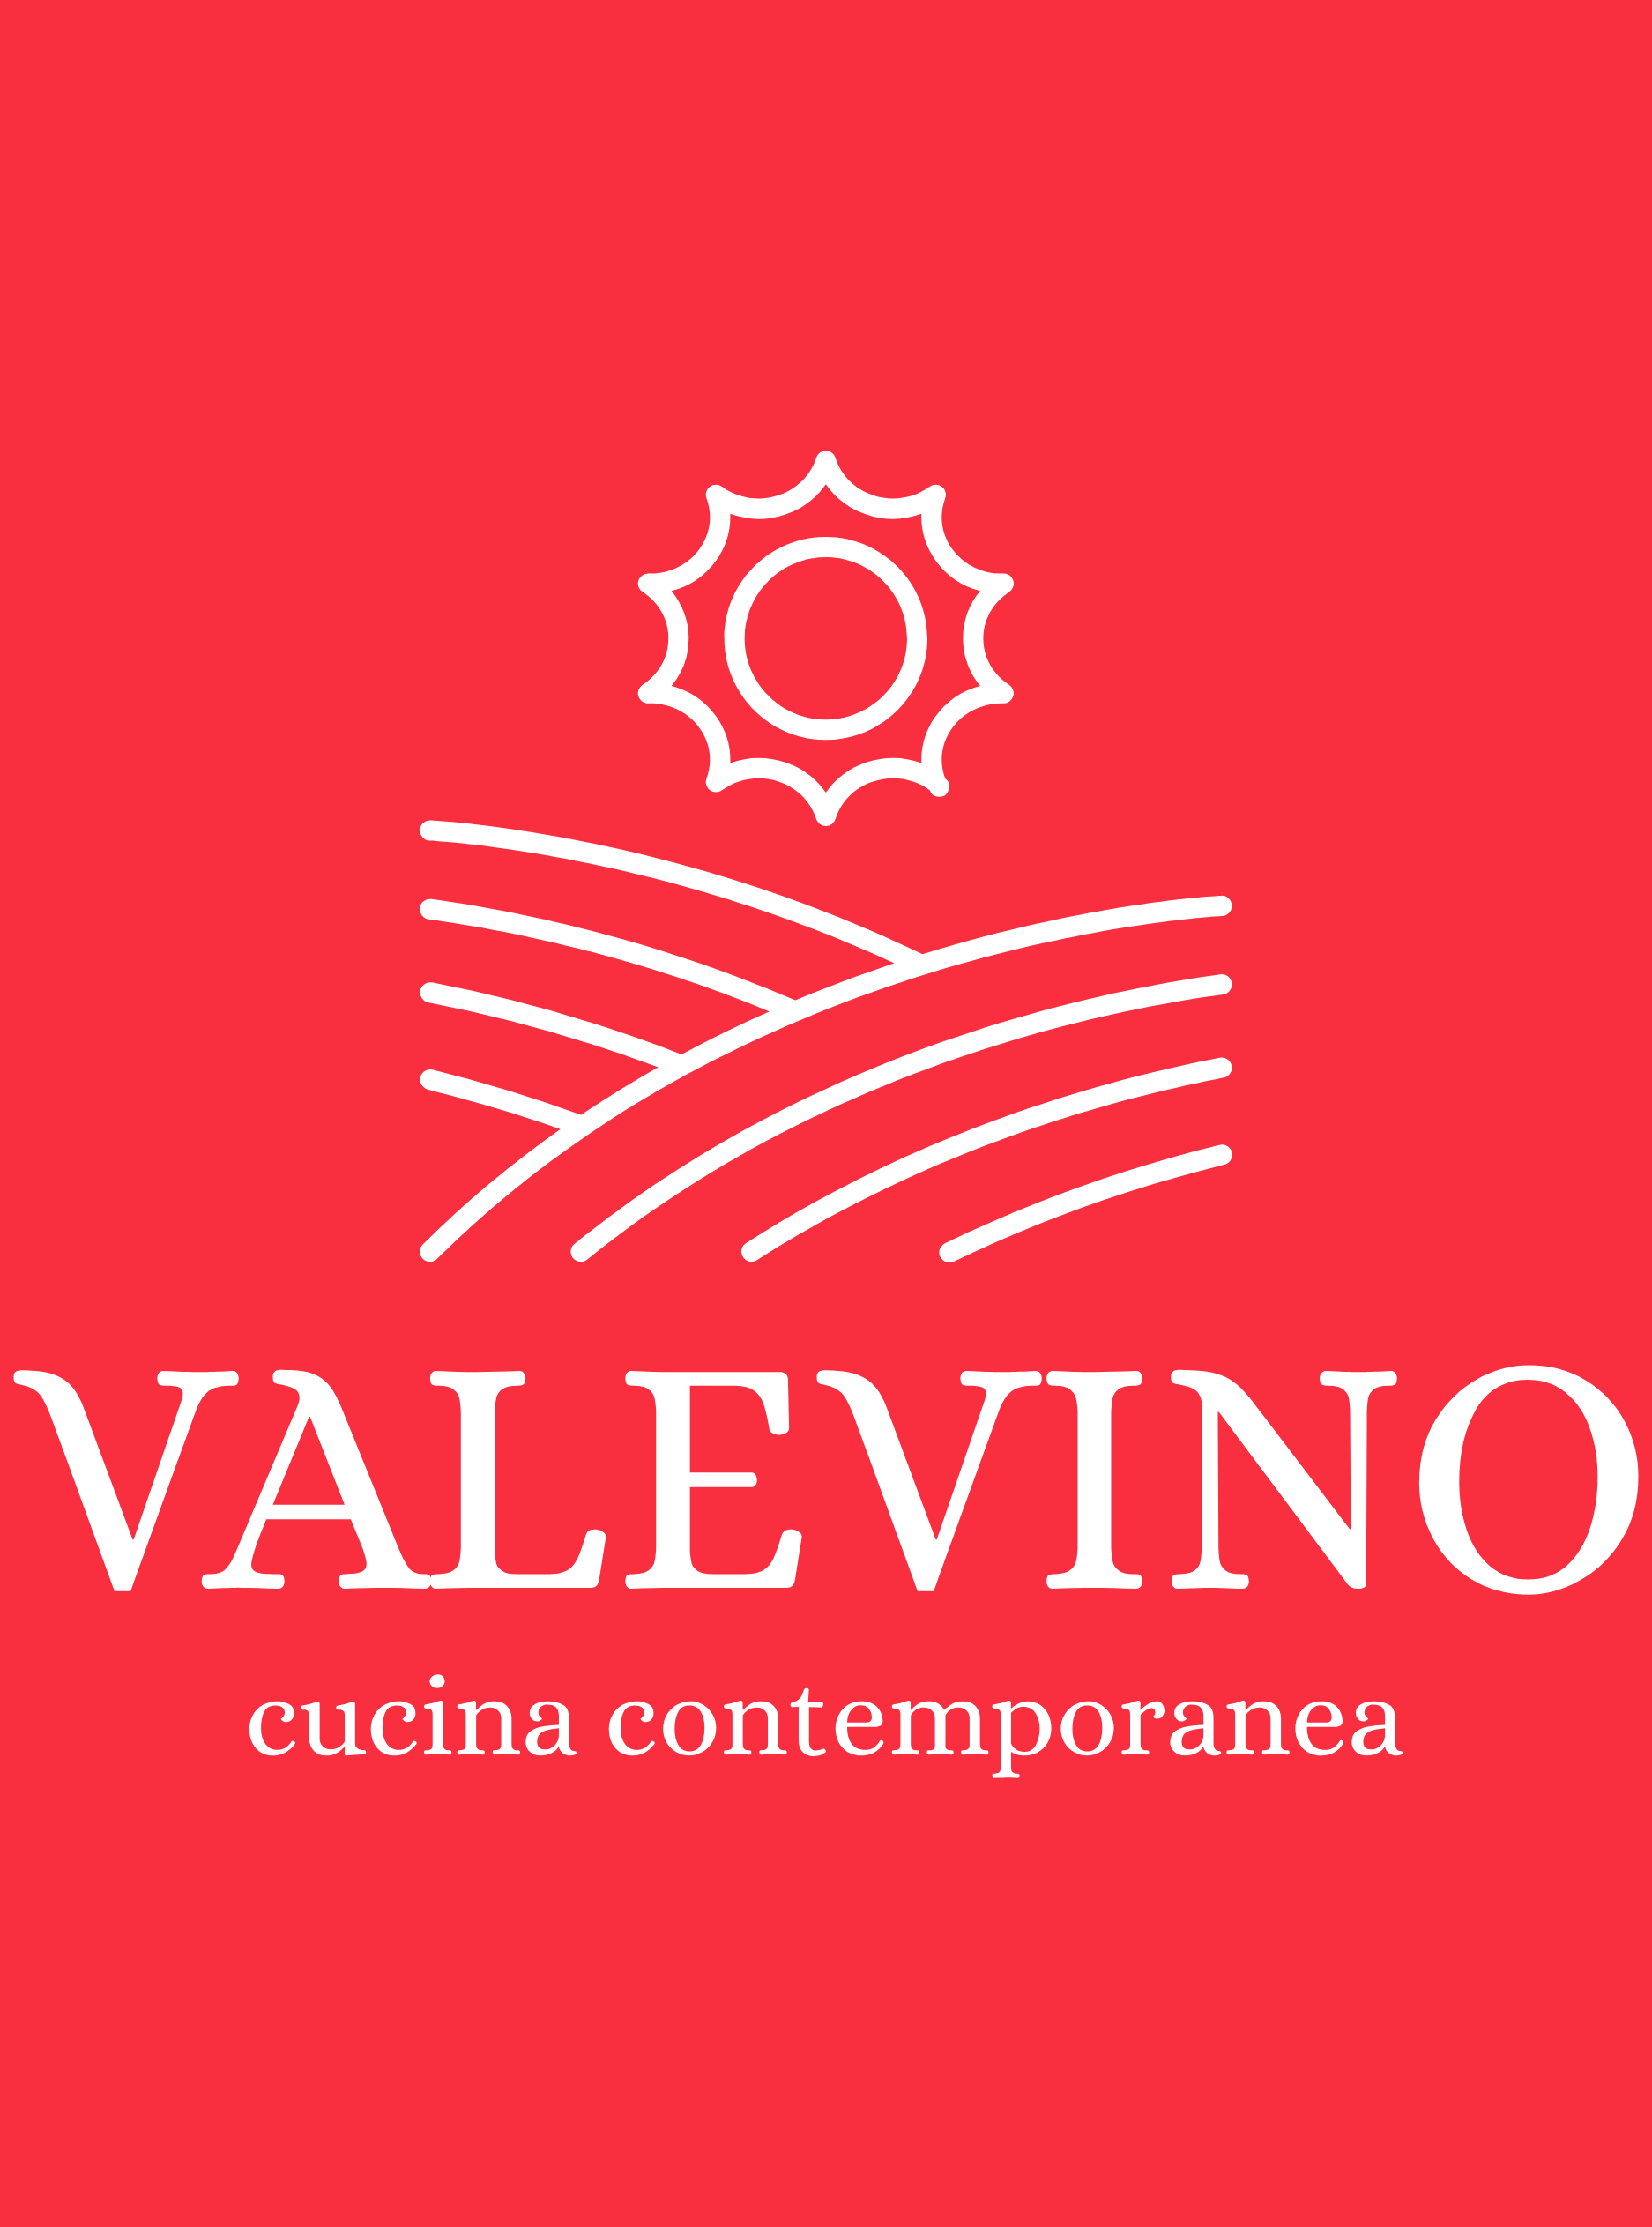 Valevino